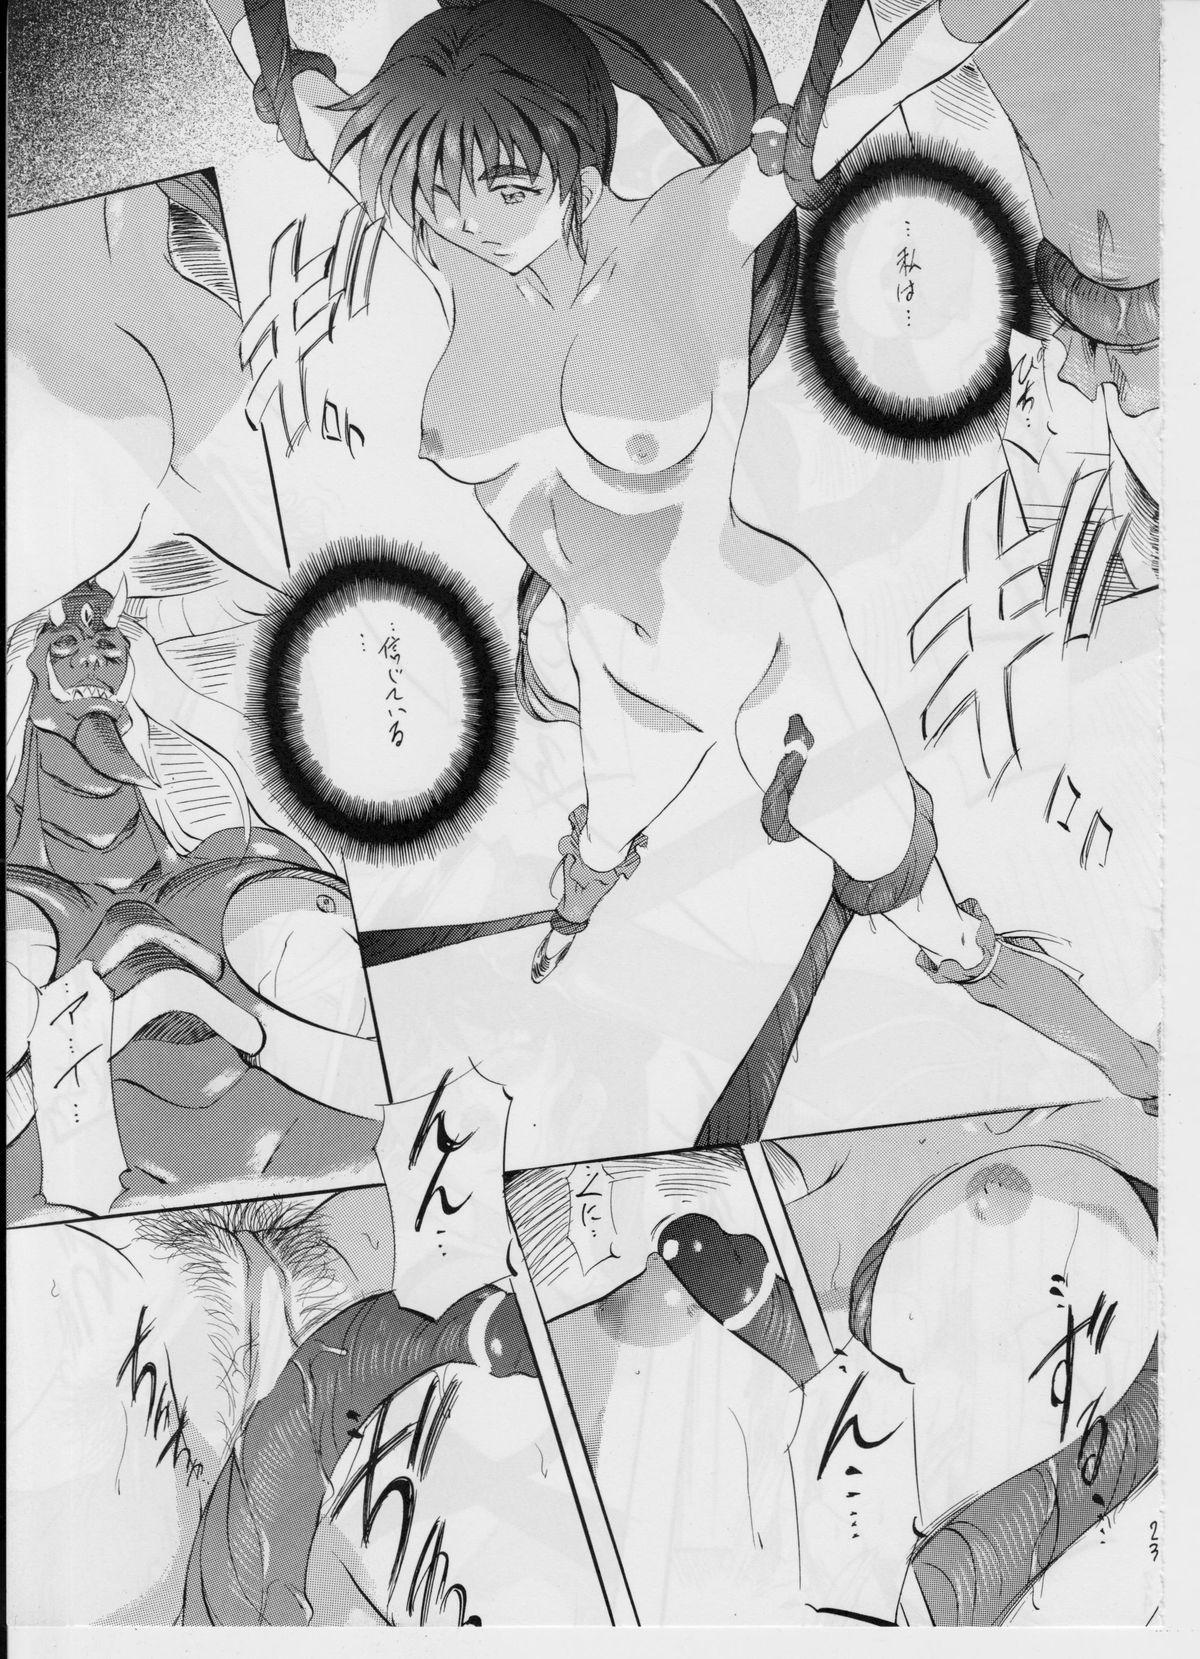 [Busou Megami (Kannaduki Kanna)] Ai & Mai Gaiden -Aoki Seido-Kouhen- (Inju Seisen Twin Angels) 22